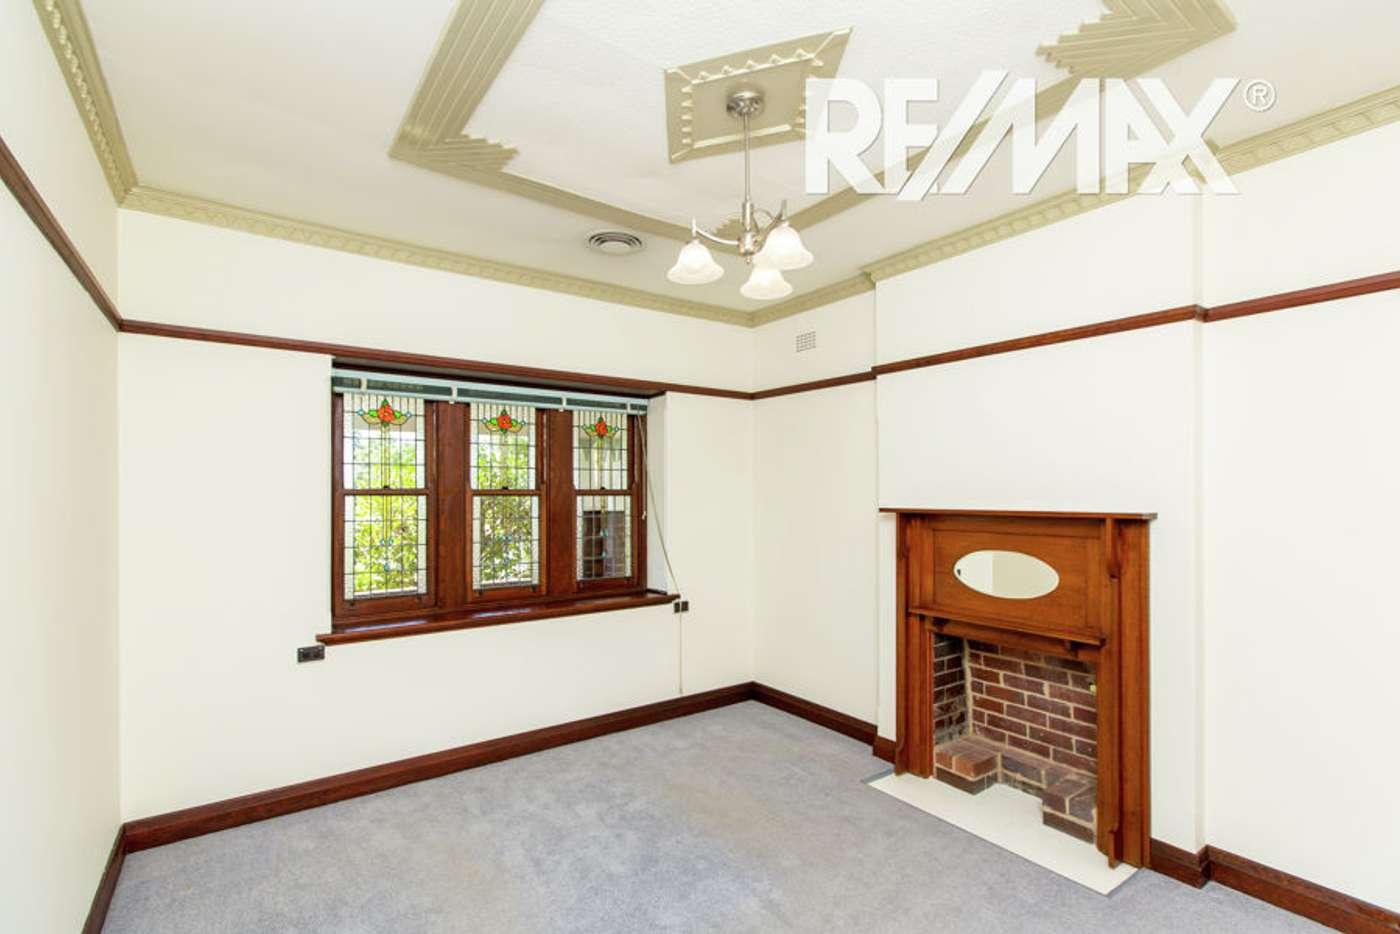 Sixth view of Homely house listing, 26 Docker Street, Wagga Wagga NSW 2650